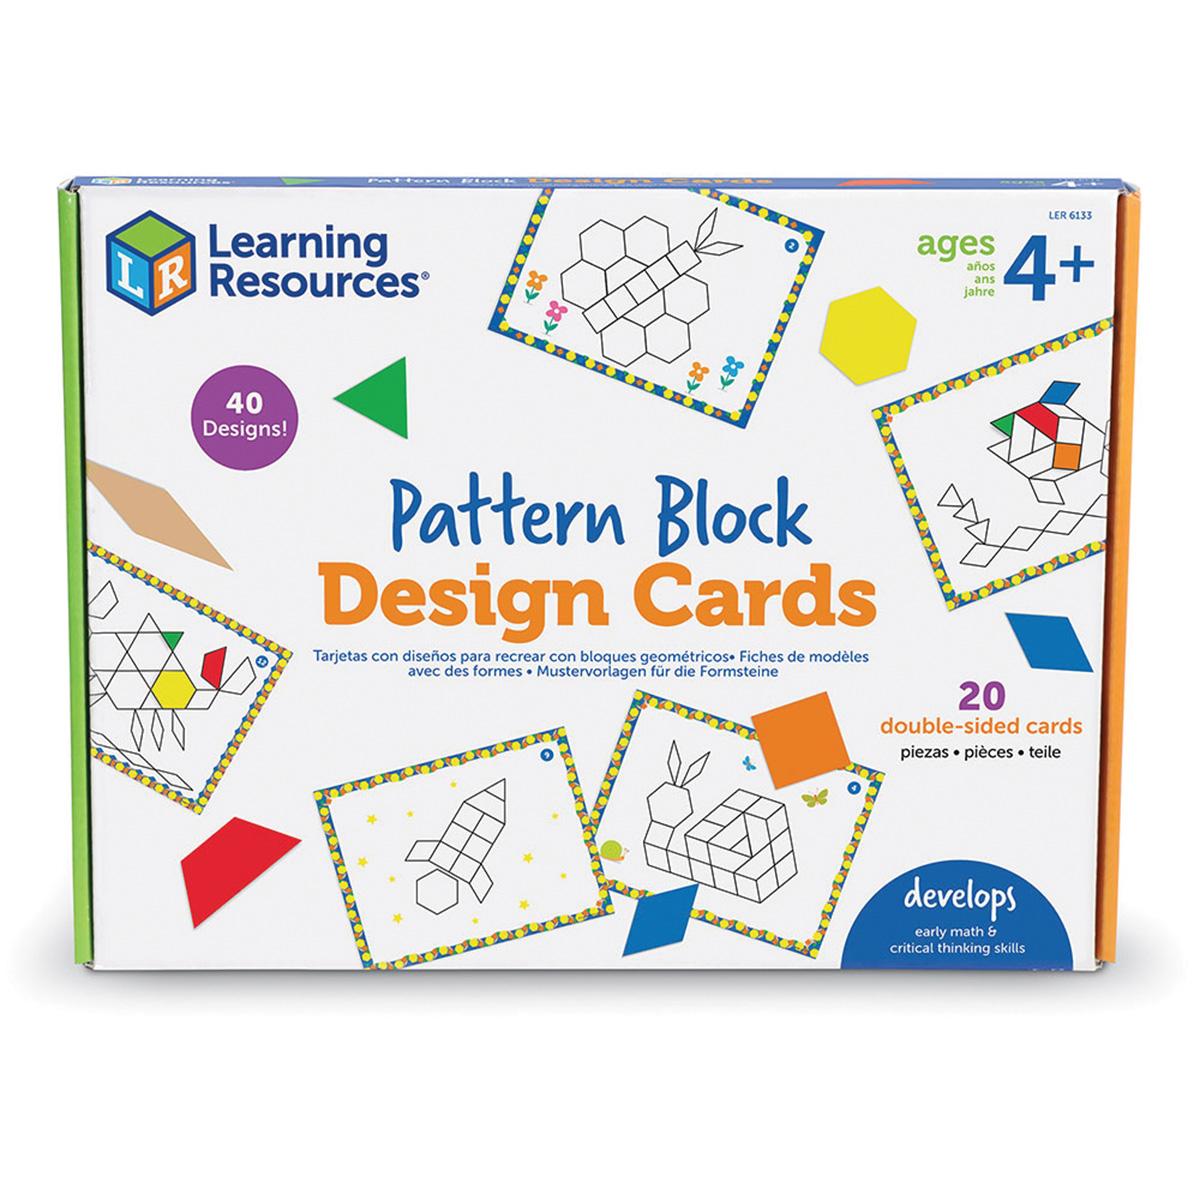 Pattern Block Design Cards